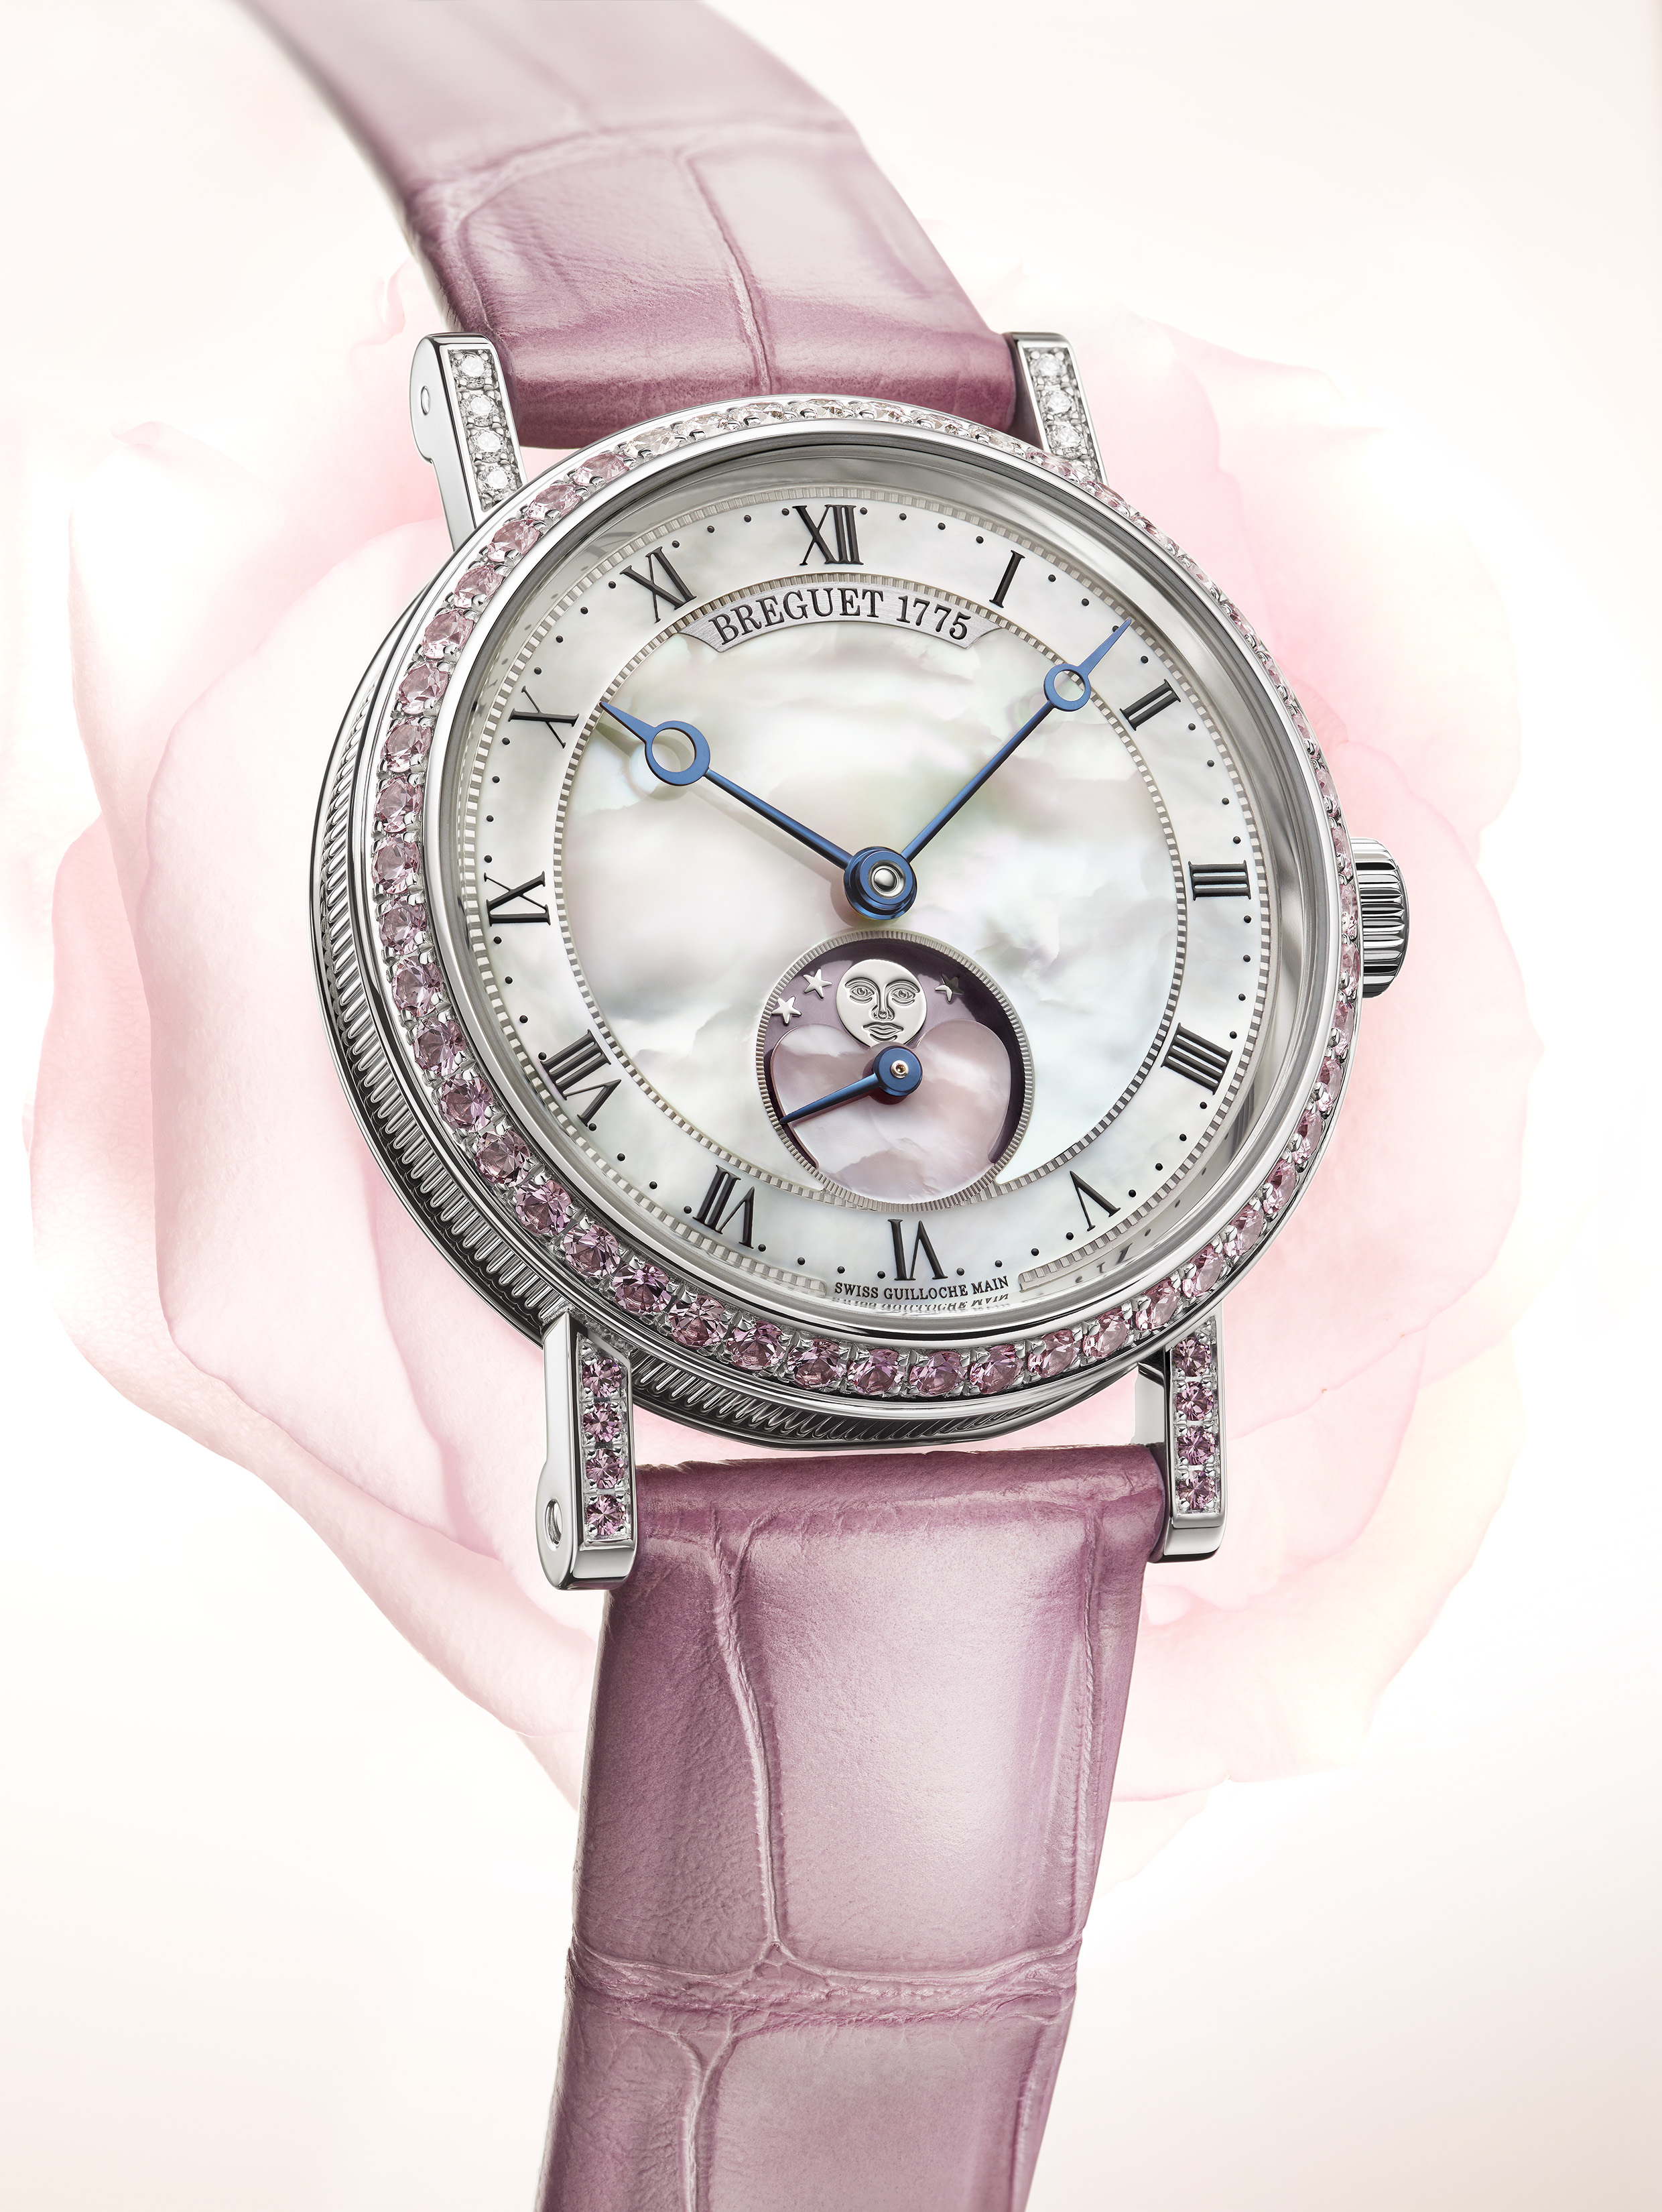 Blancpain Ultraplate Saint Valentin Watches News